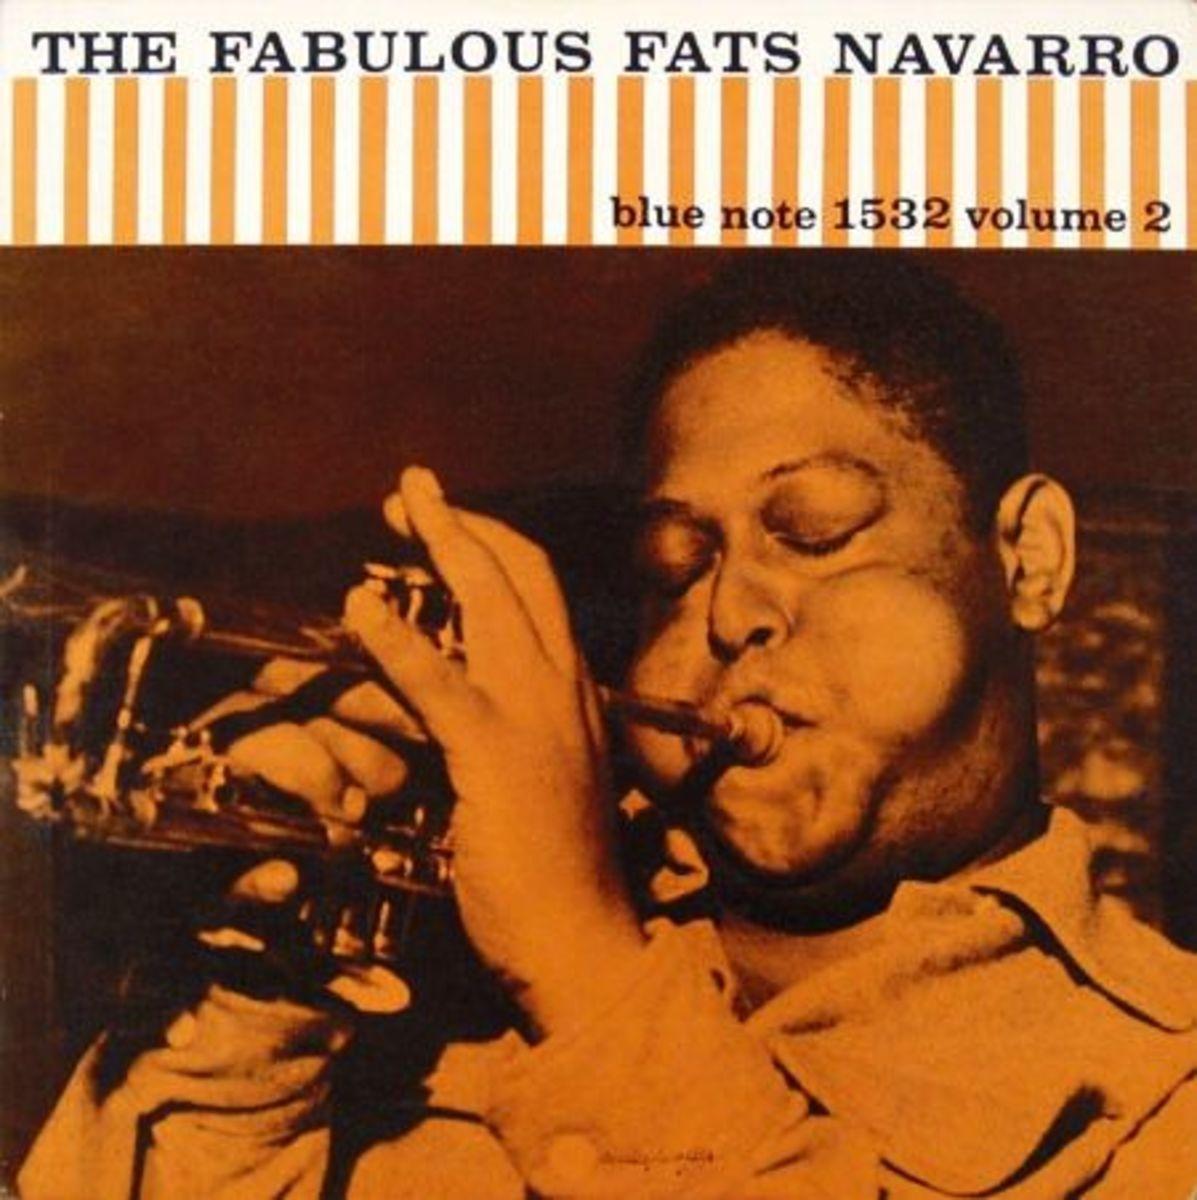 "Fats Navarro ""Fabulous Fats Navarro, vol. 2"" Blue Note Records 1532 12"" LP Vinyl Record (1956) Album Cover Design by Reid Miles, Photo by Francis Wolff"